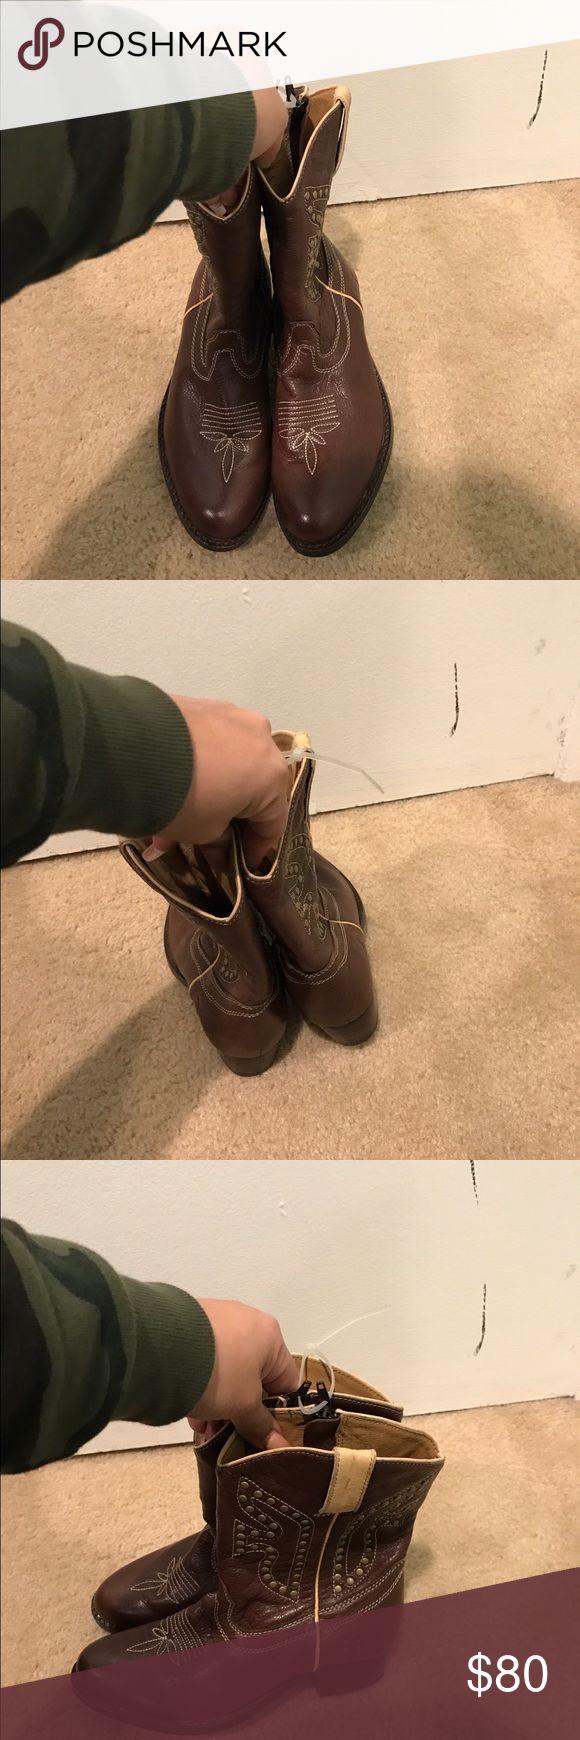 KIDS FRYE BOOTS ****Size 2**** BRAND NEW kids western Boots!! kids size -2 Frye Shoes Ankle Boots & Booties